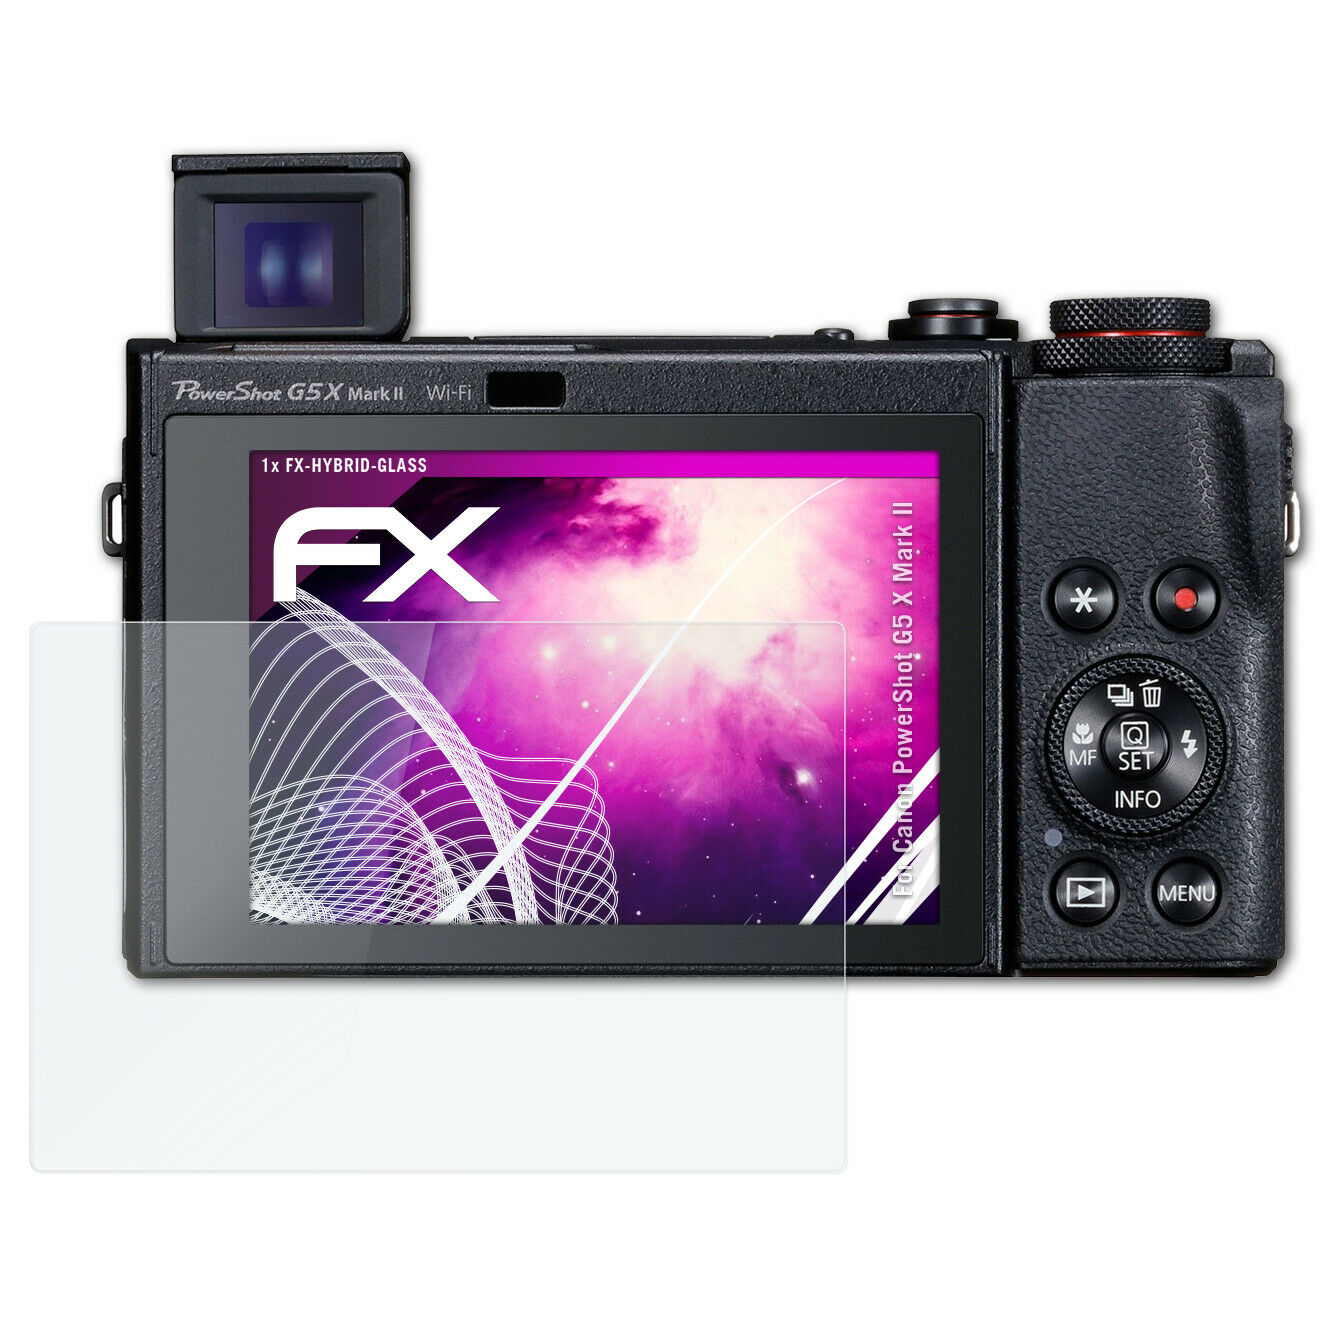 2x protector de pantalla mate Canon PowerShot g12 recubrimiento protector protector de pantalla Lámina